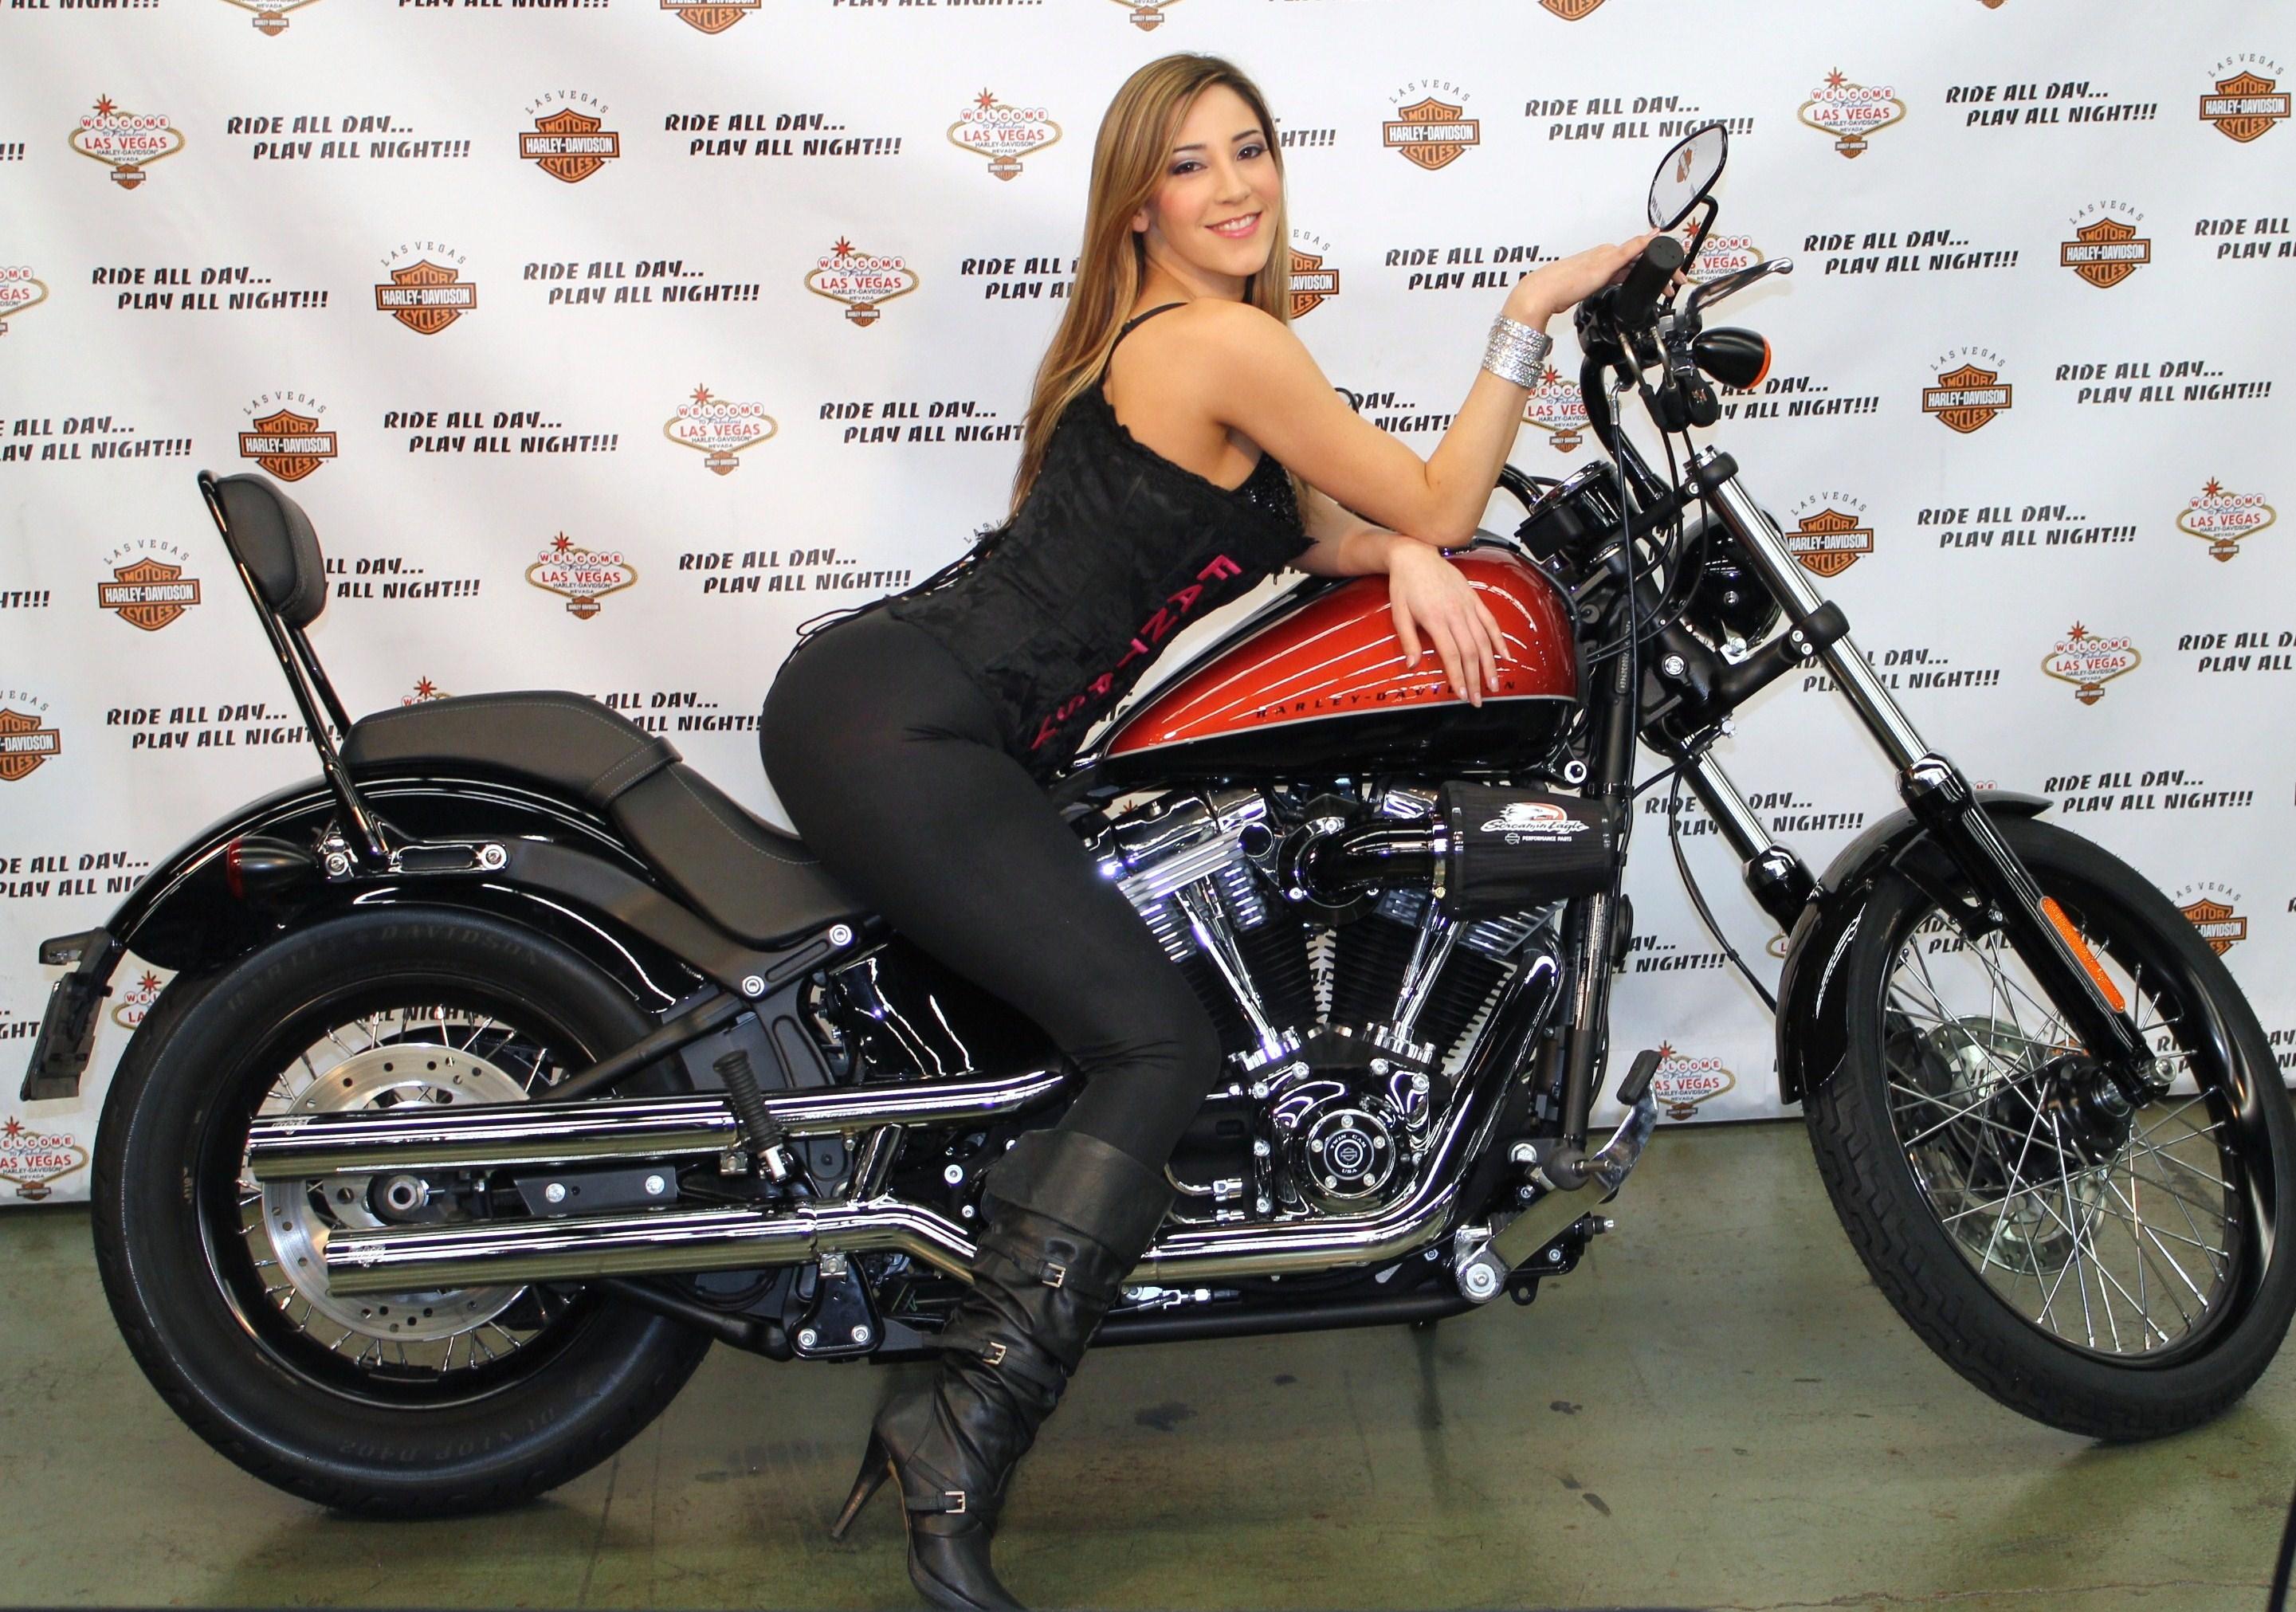 Hot Bike Wallpapers - 2881x2023 - Download HD Wallpaper - WallpaperTip